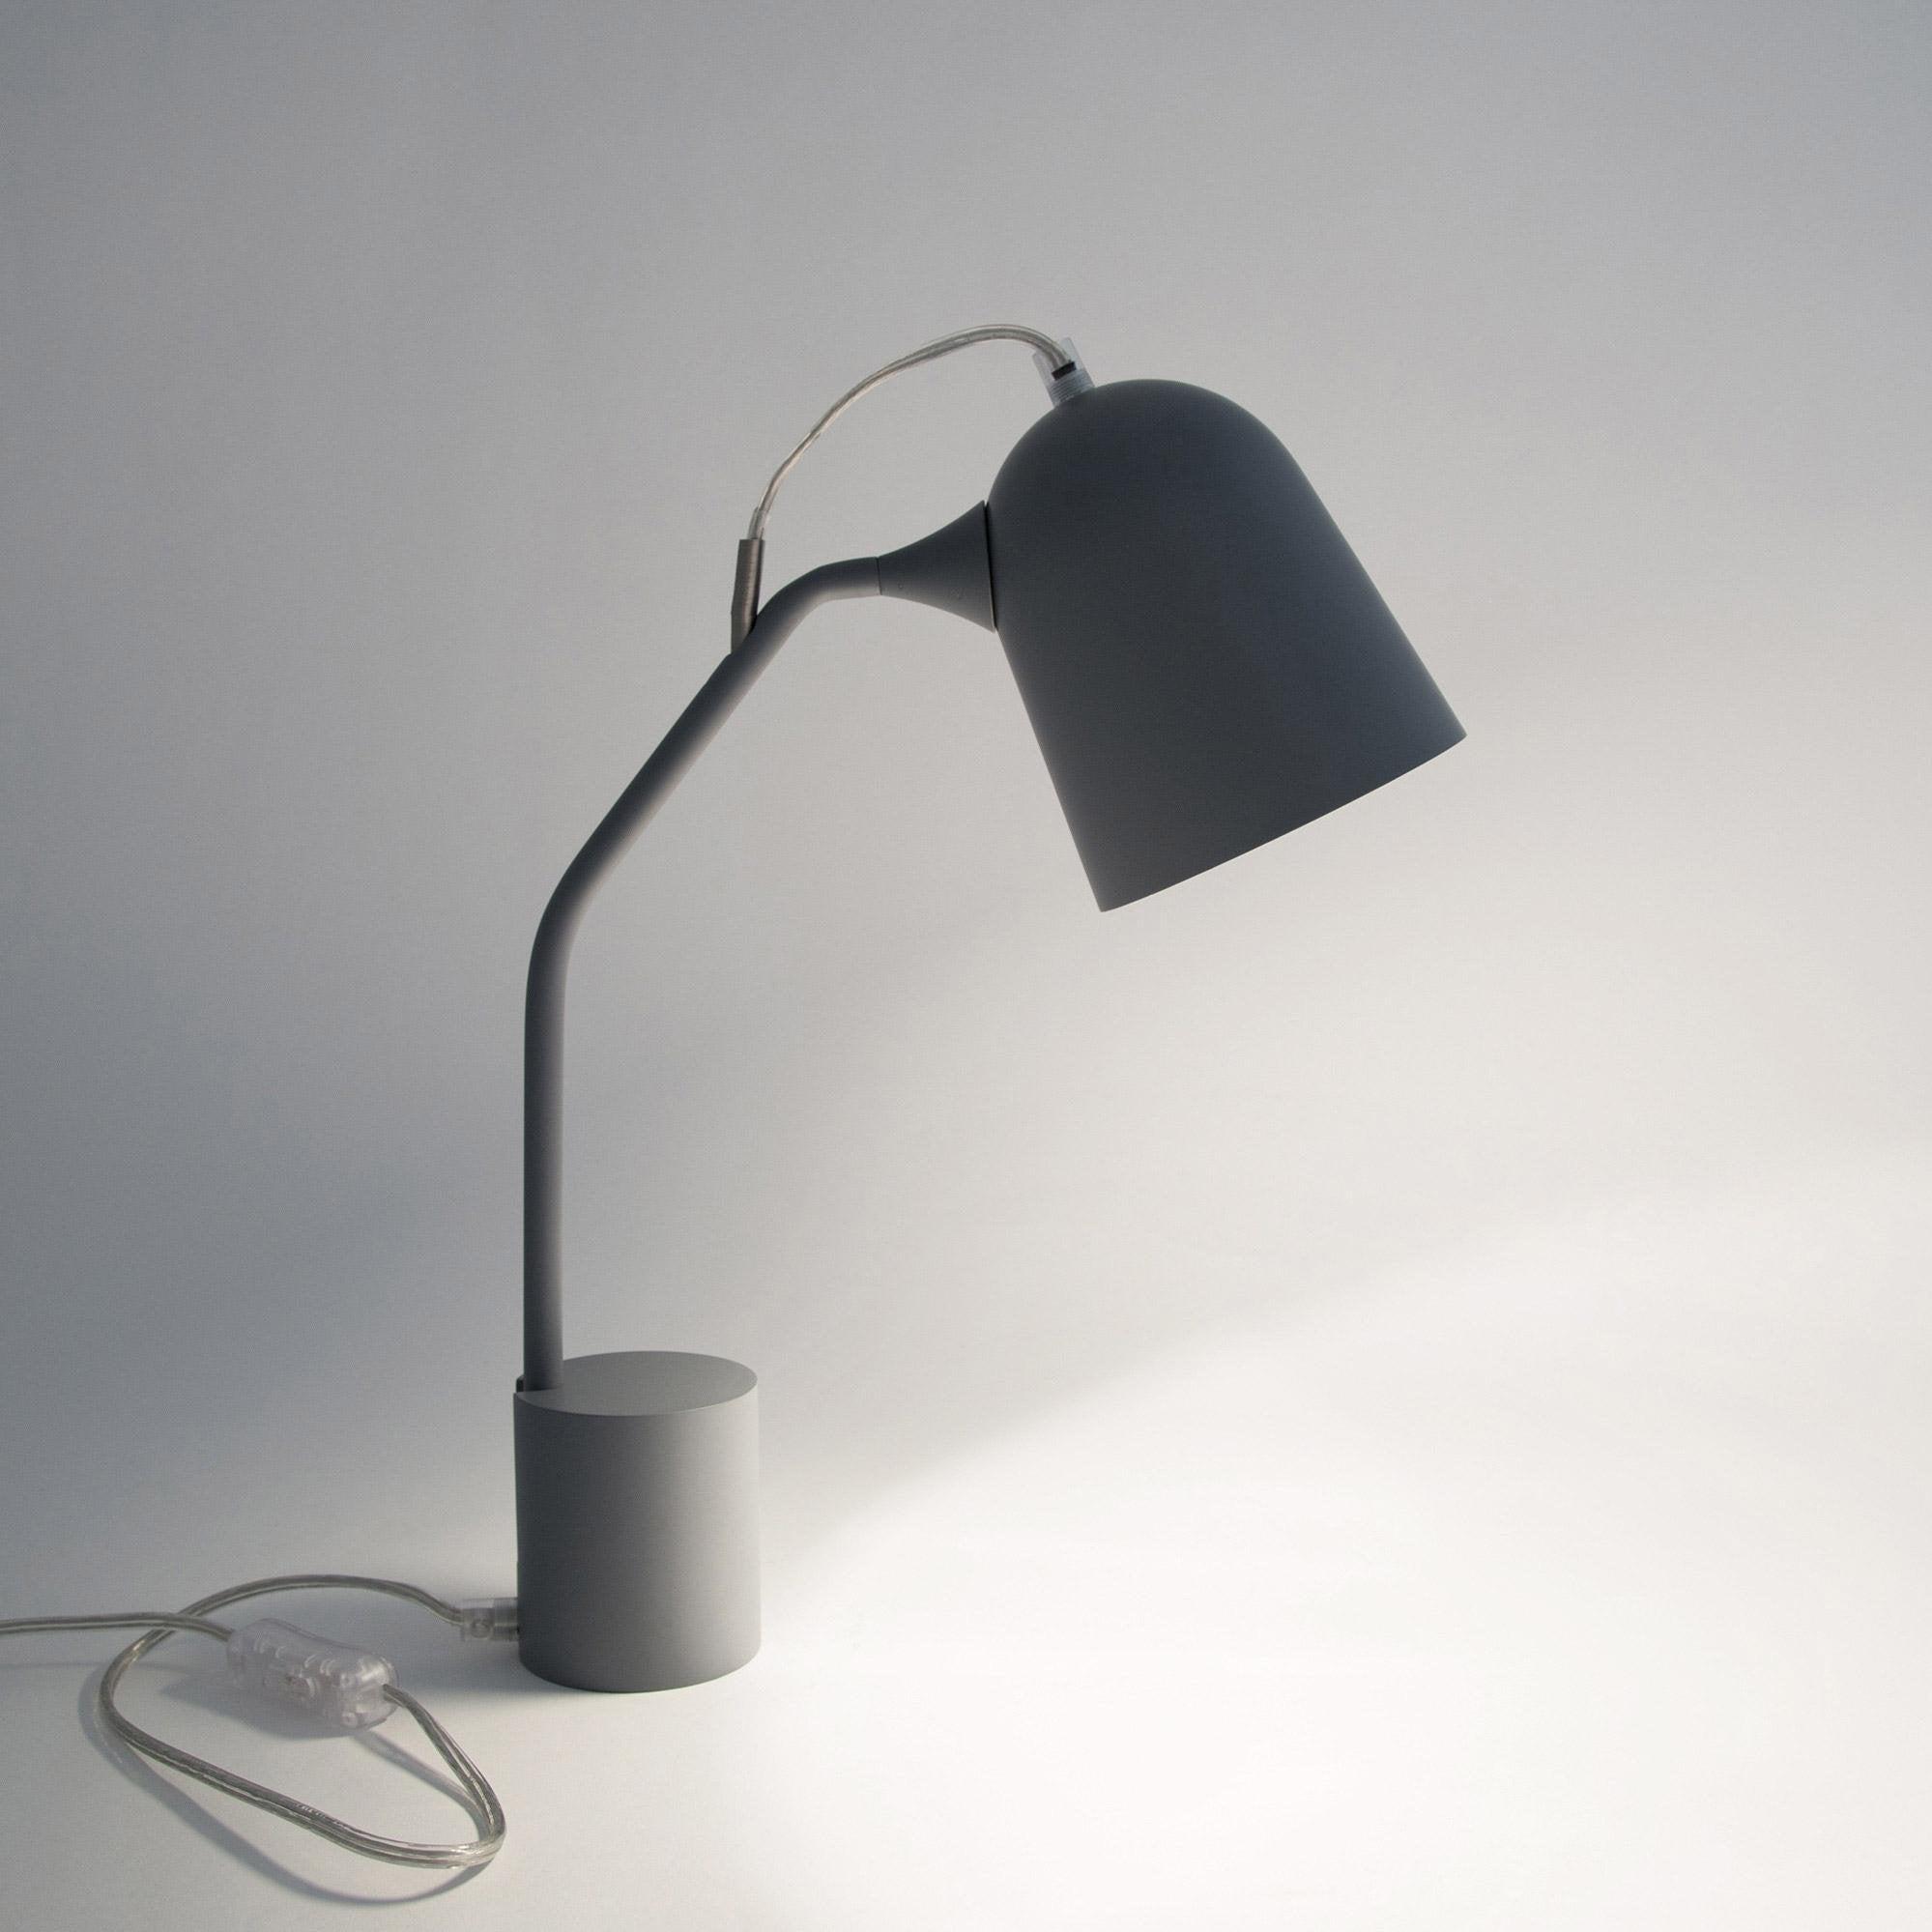 Lampe de bureau, design, métal gris, LO EDITIONS Magnétic